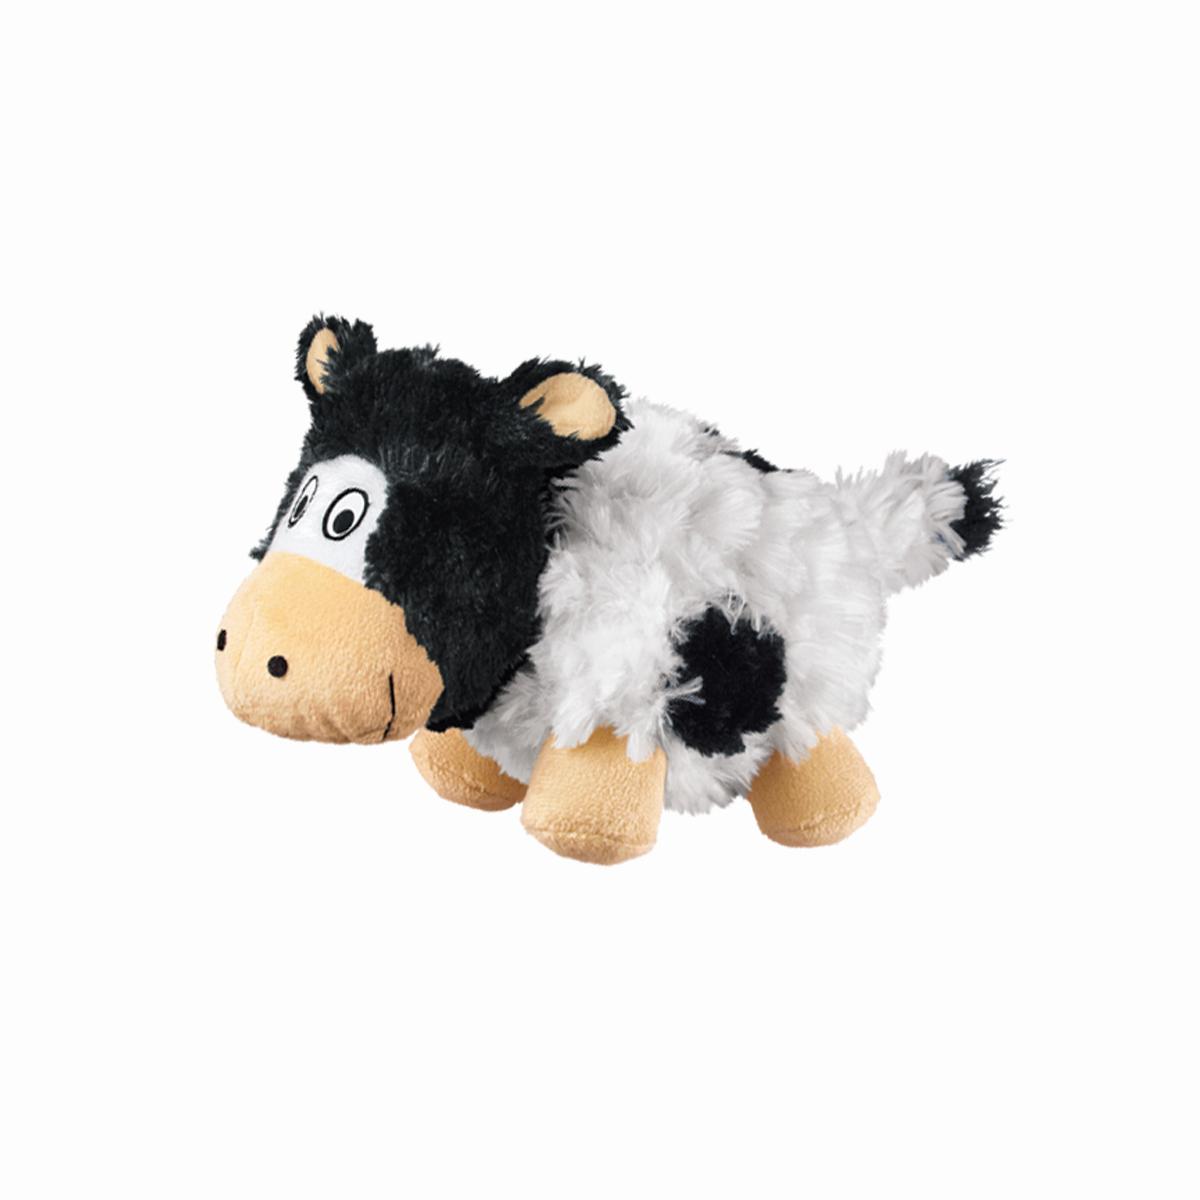 KO BARNYARD CRUNCHEEZ COW S 00001